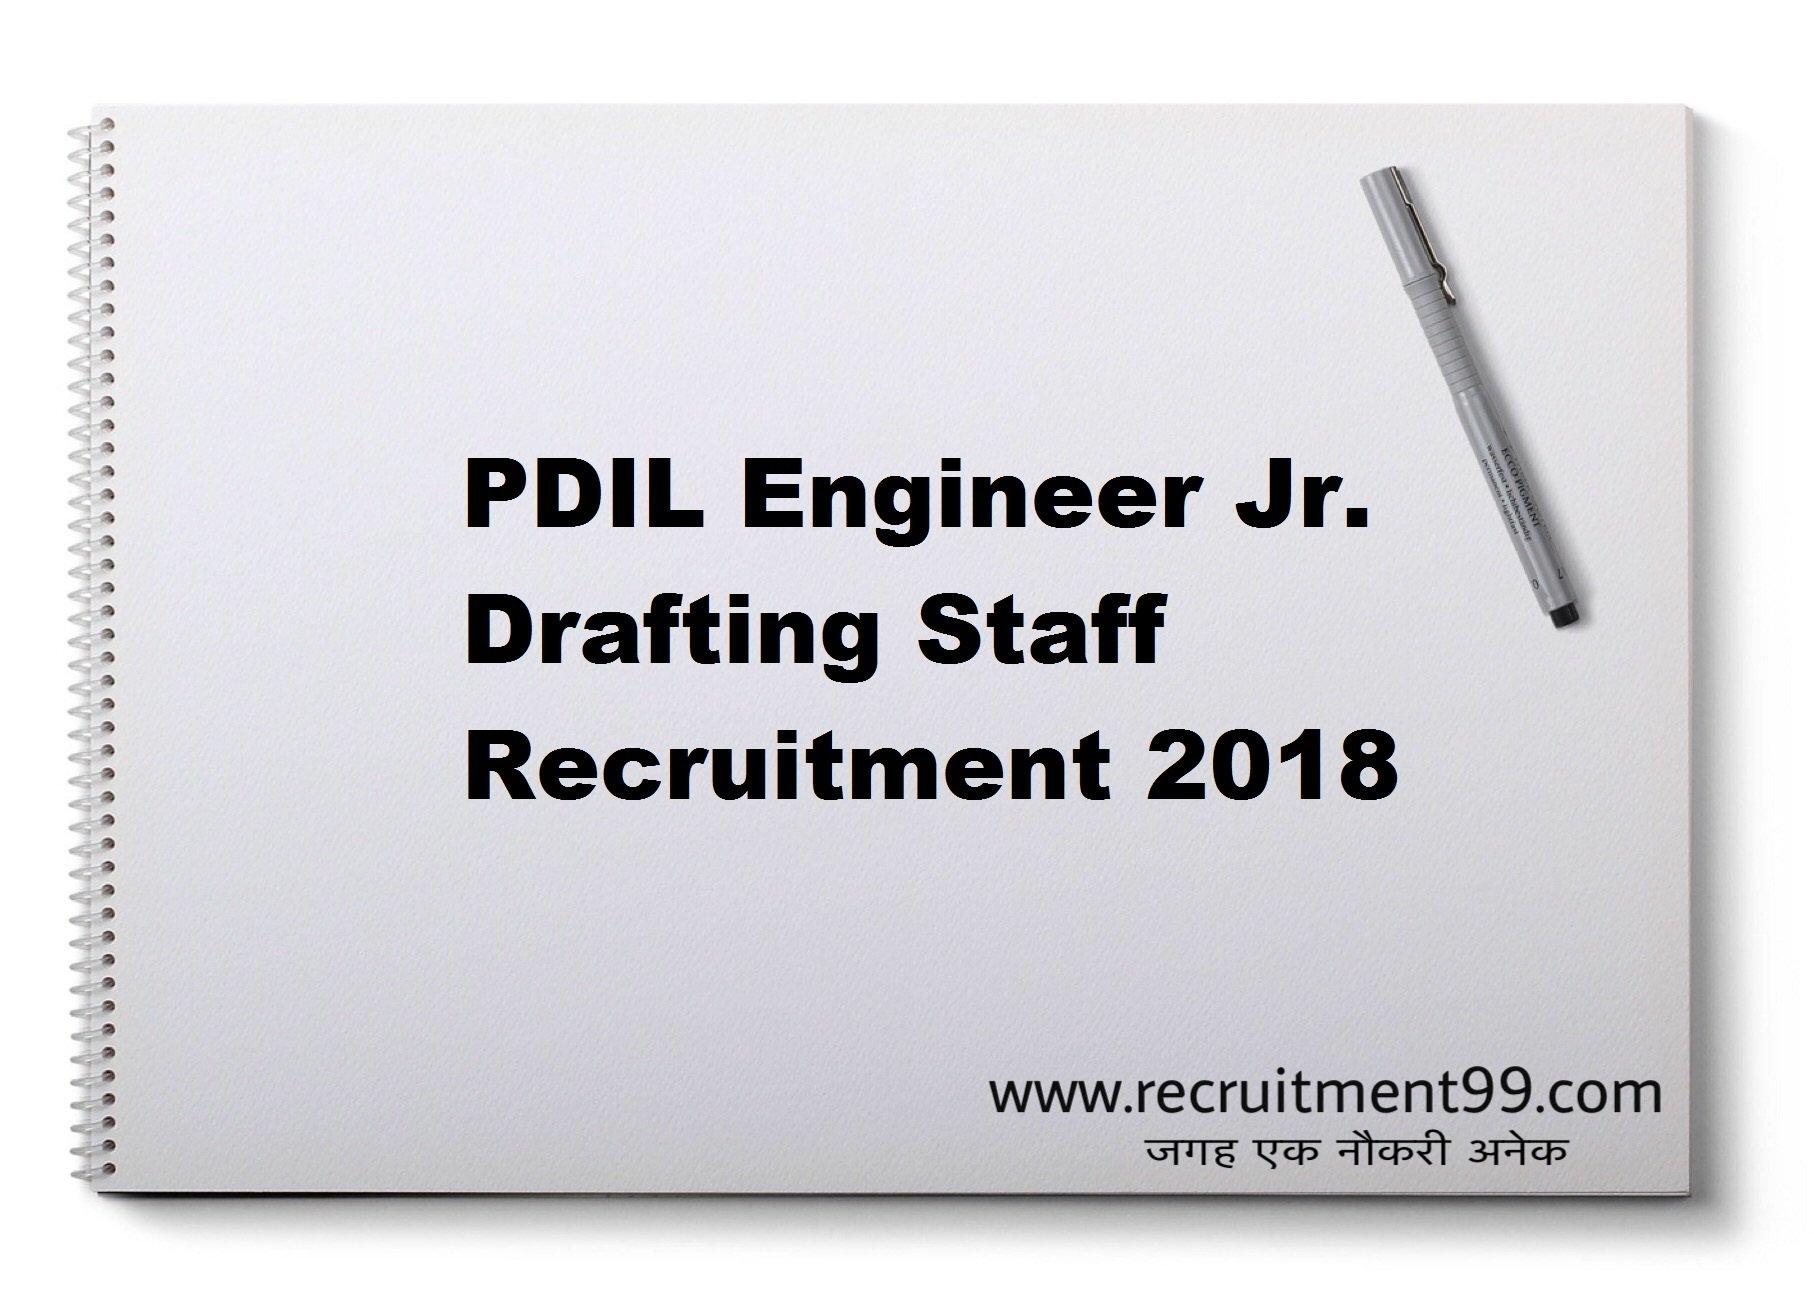 PDIL Engineer Jr. Drafting Staff Recruitment Admit Card Result 2018